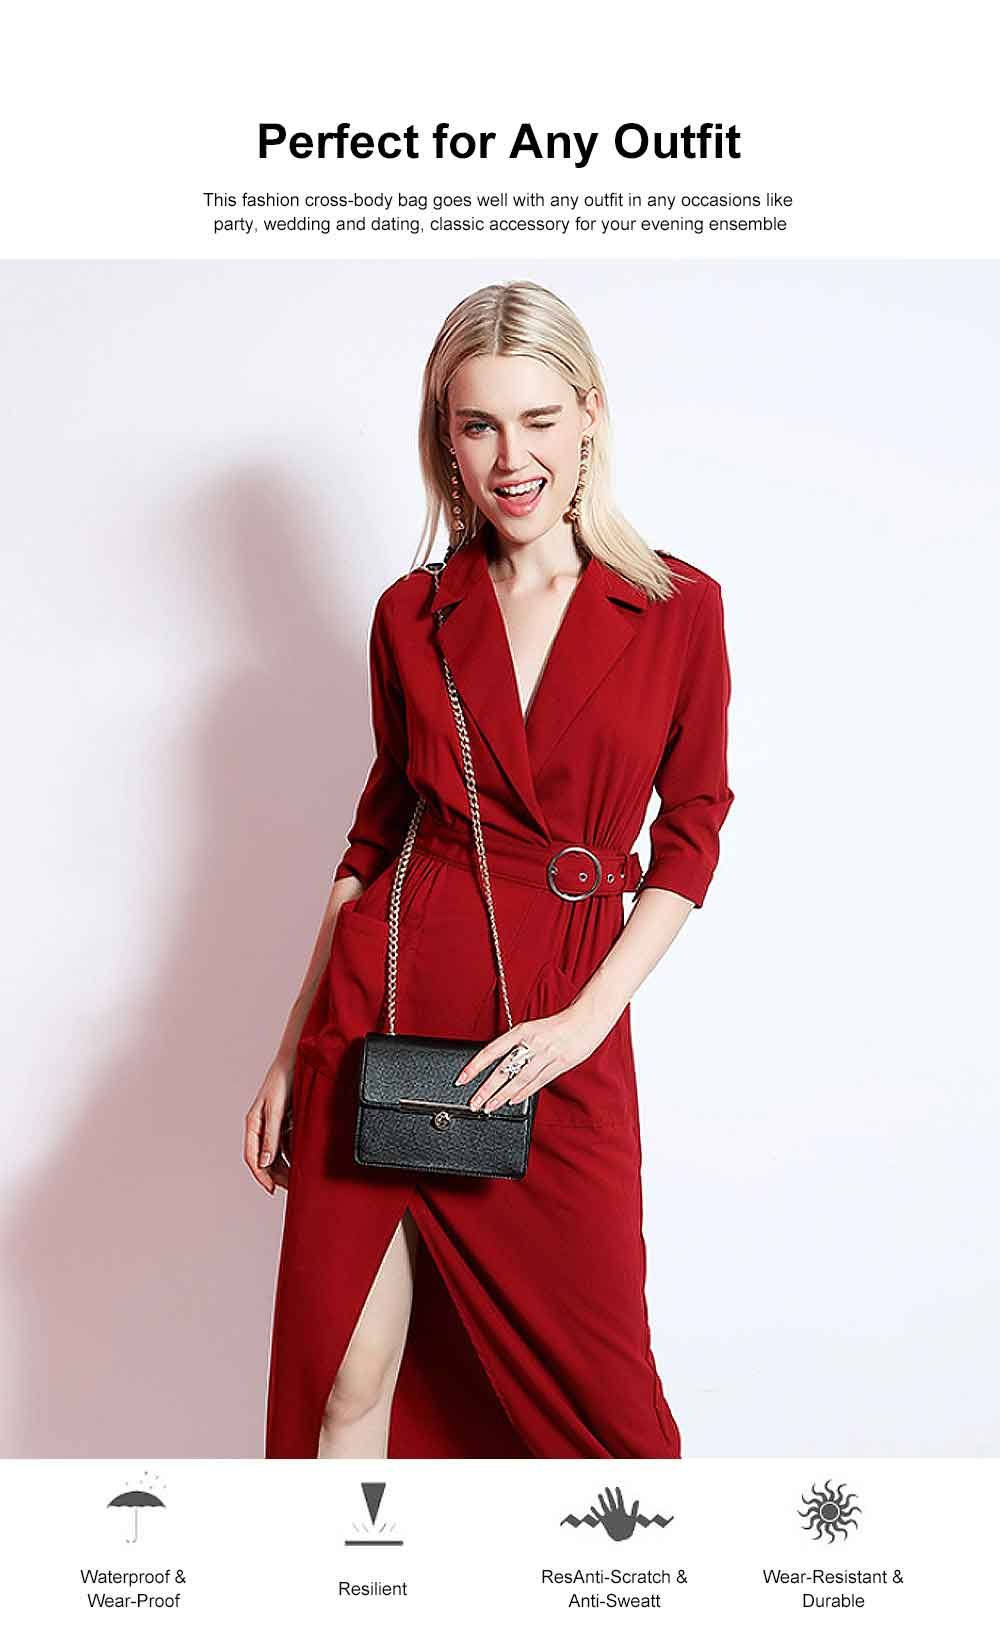 PU Leather Cross-Body Shoulder Clutch Purse Evening Handbag with Chain 2